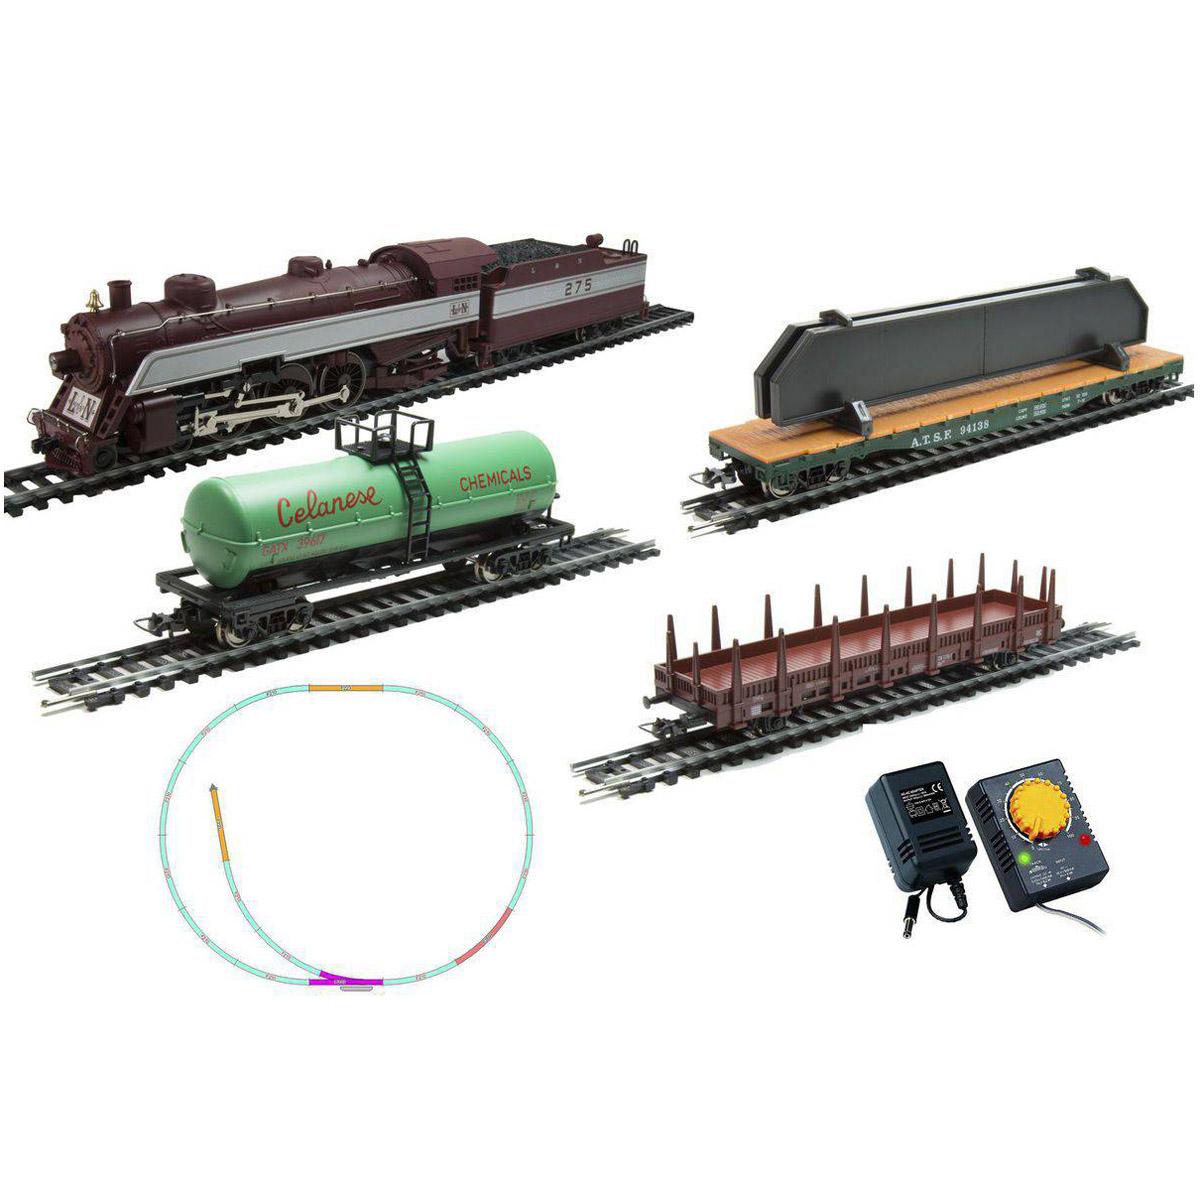 Стартовый набор Mehano Prestige паровоз  L&amp;amp;N (4-6-2) с 3-мя вагонами (коричневый)<br>